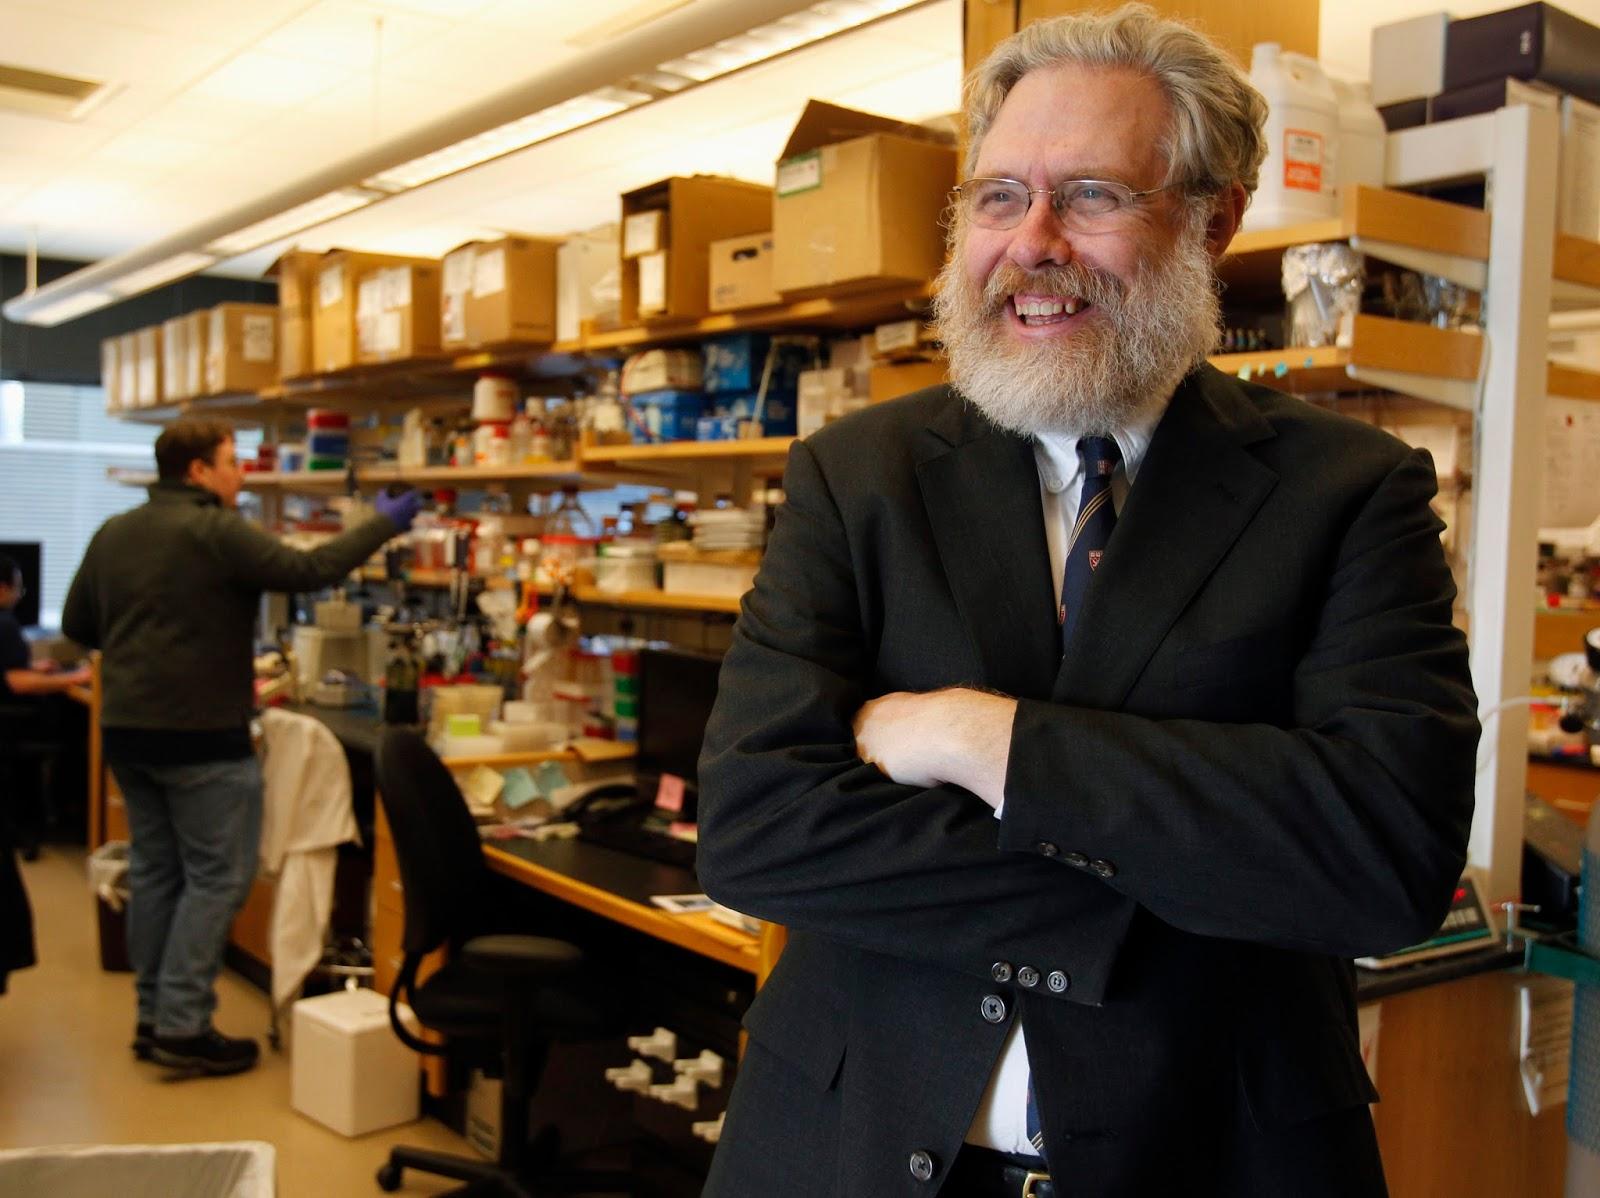 Giáo sư George Church tại Harvard & dự án Nebula Genomic dựa trên nền tảng blockchain